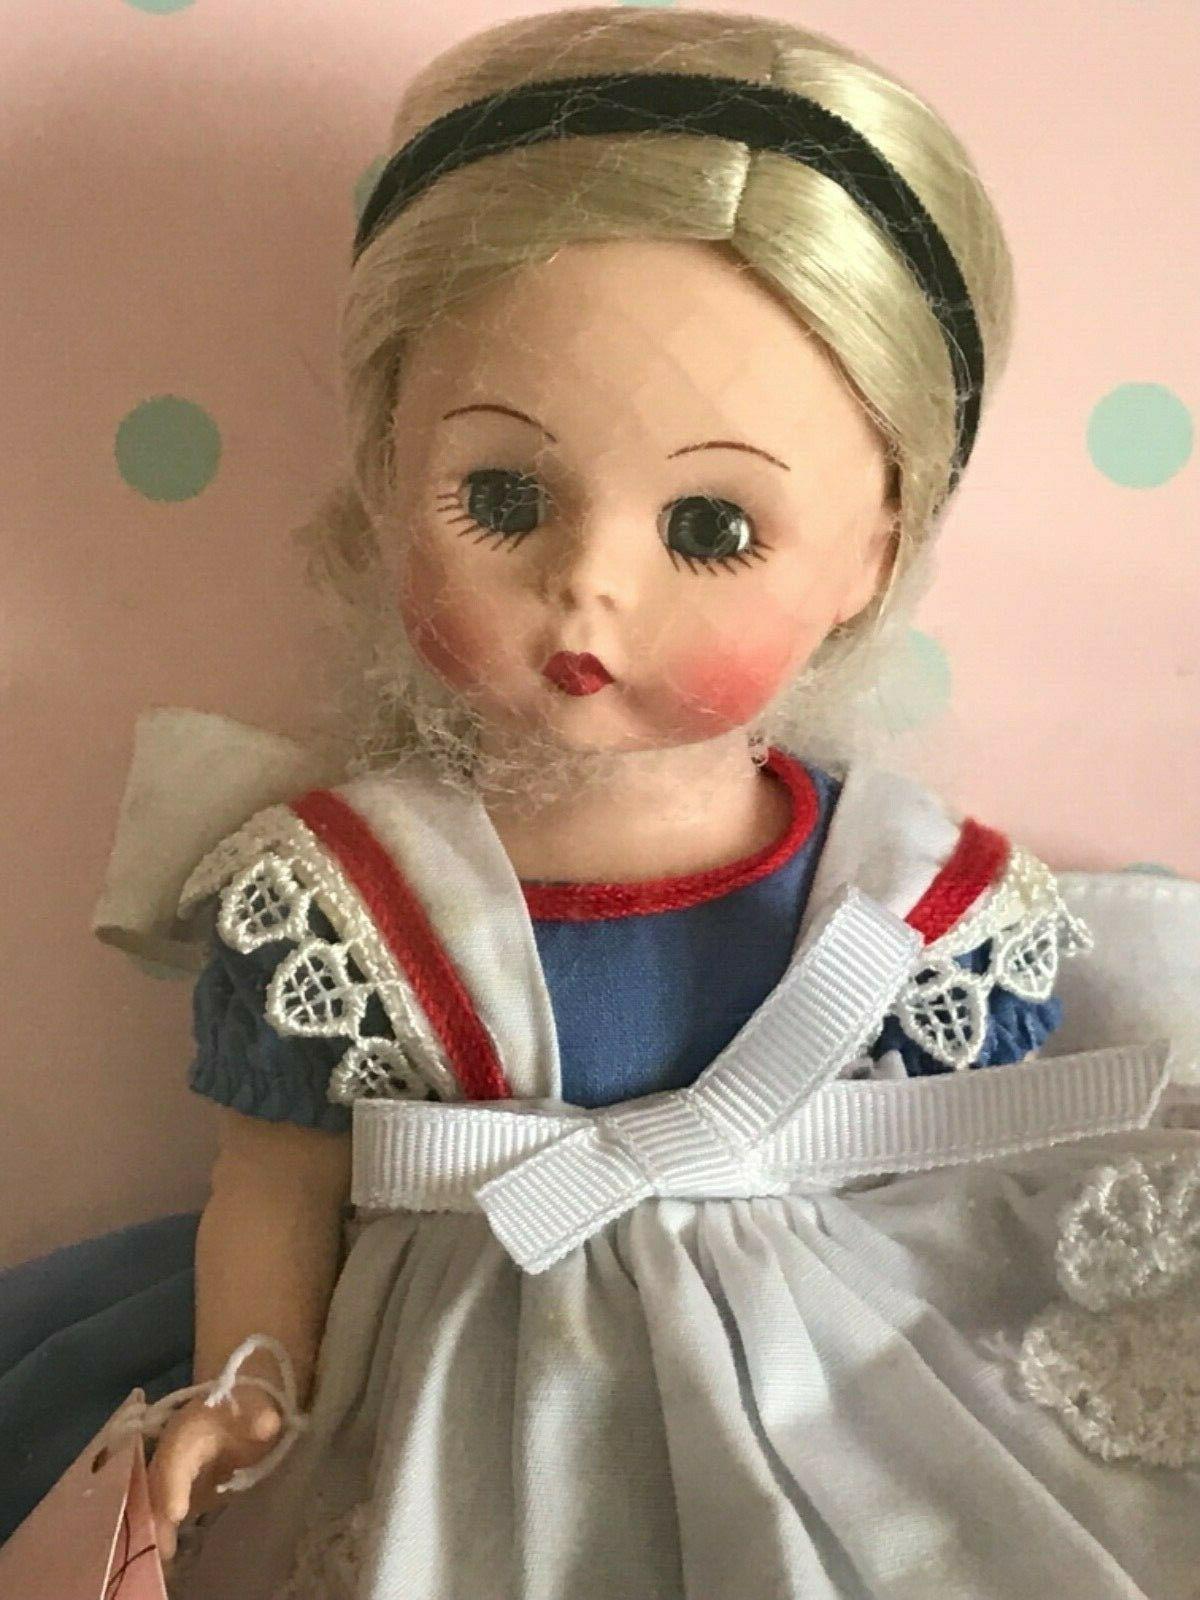 Madame Doll #42425 Alice in Wonderland Collection NIB